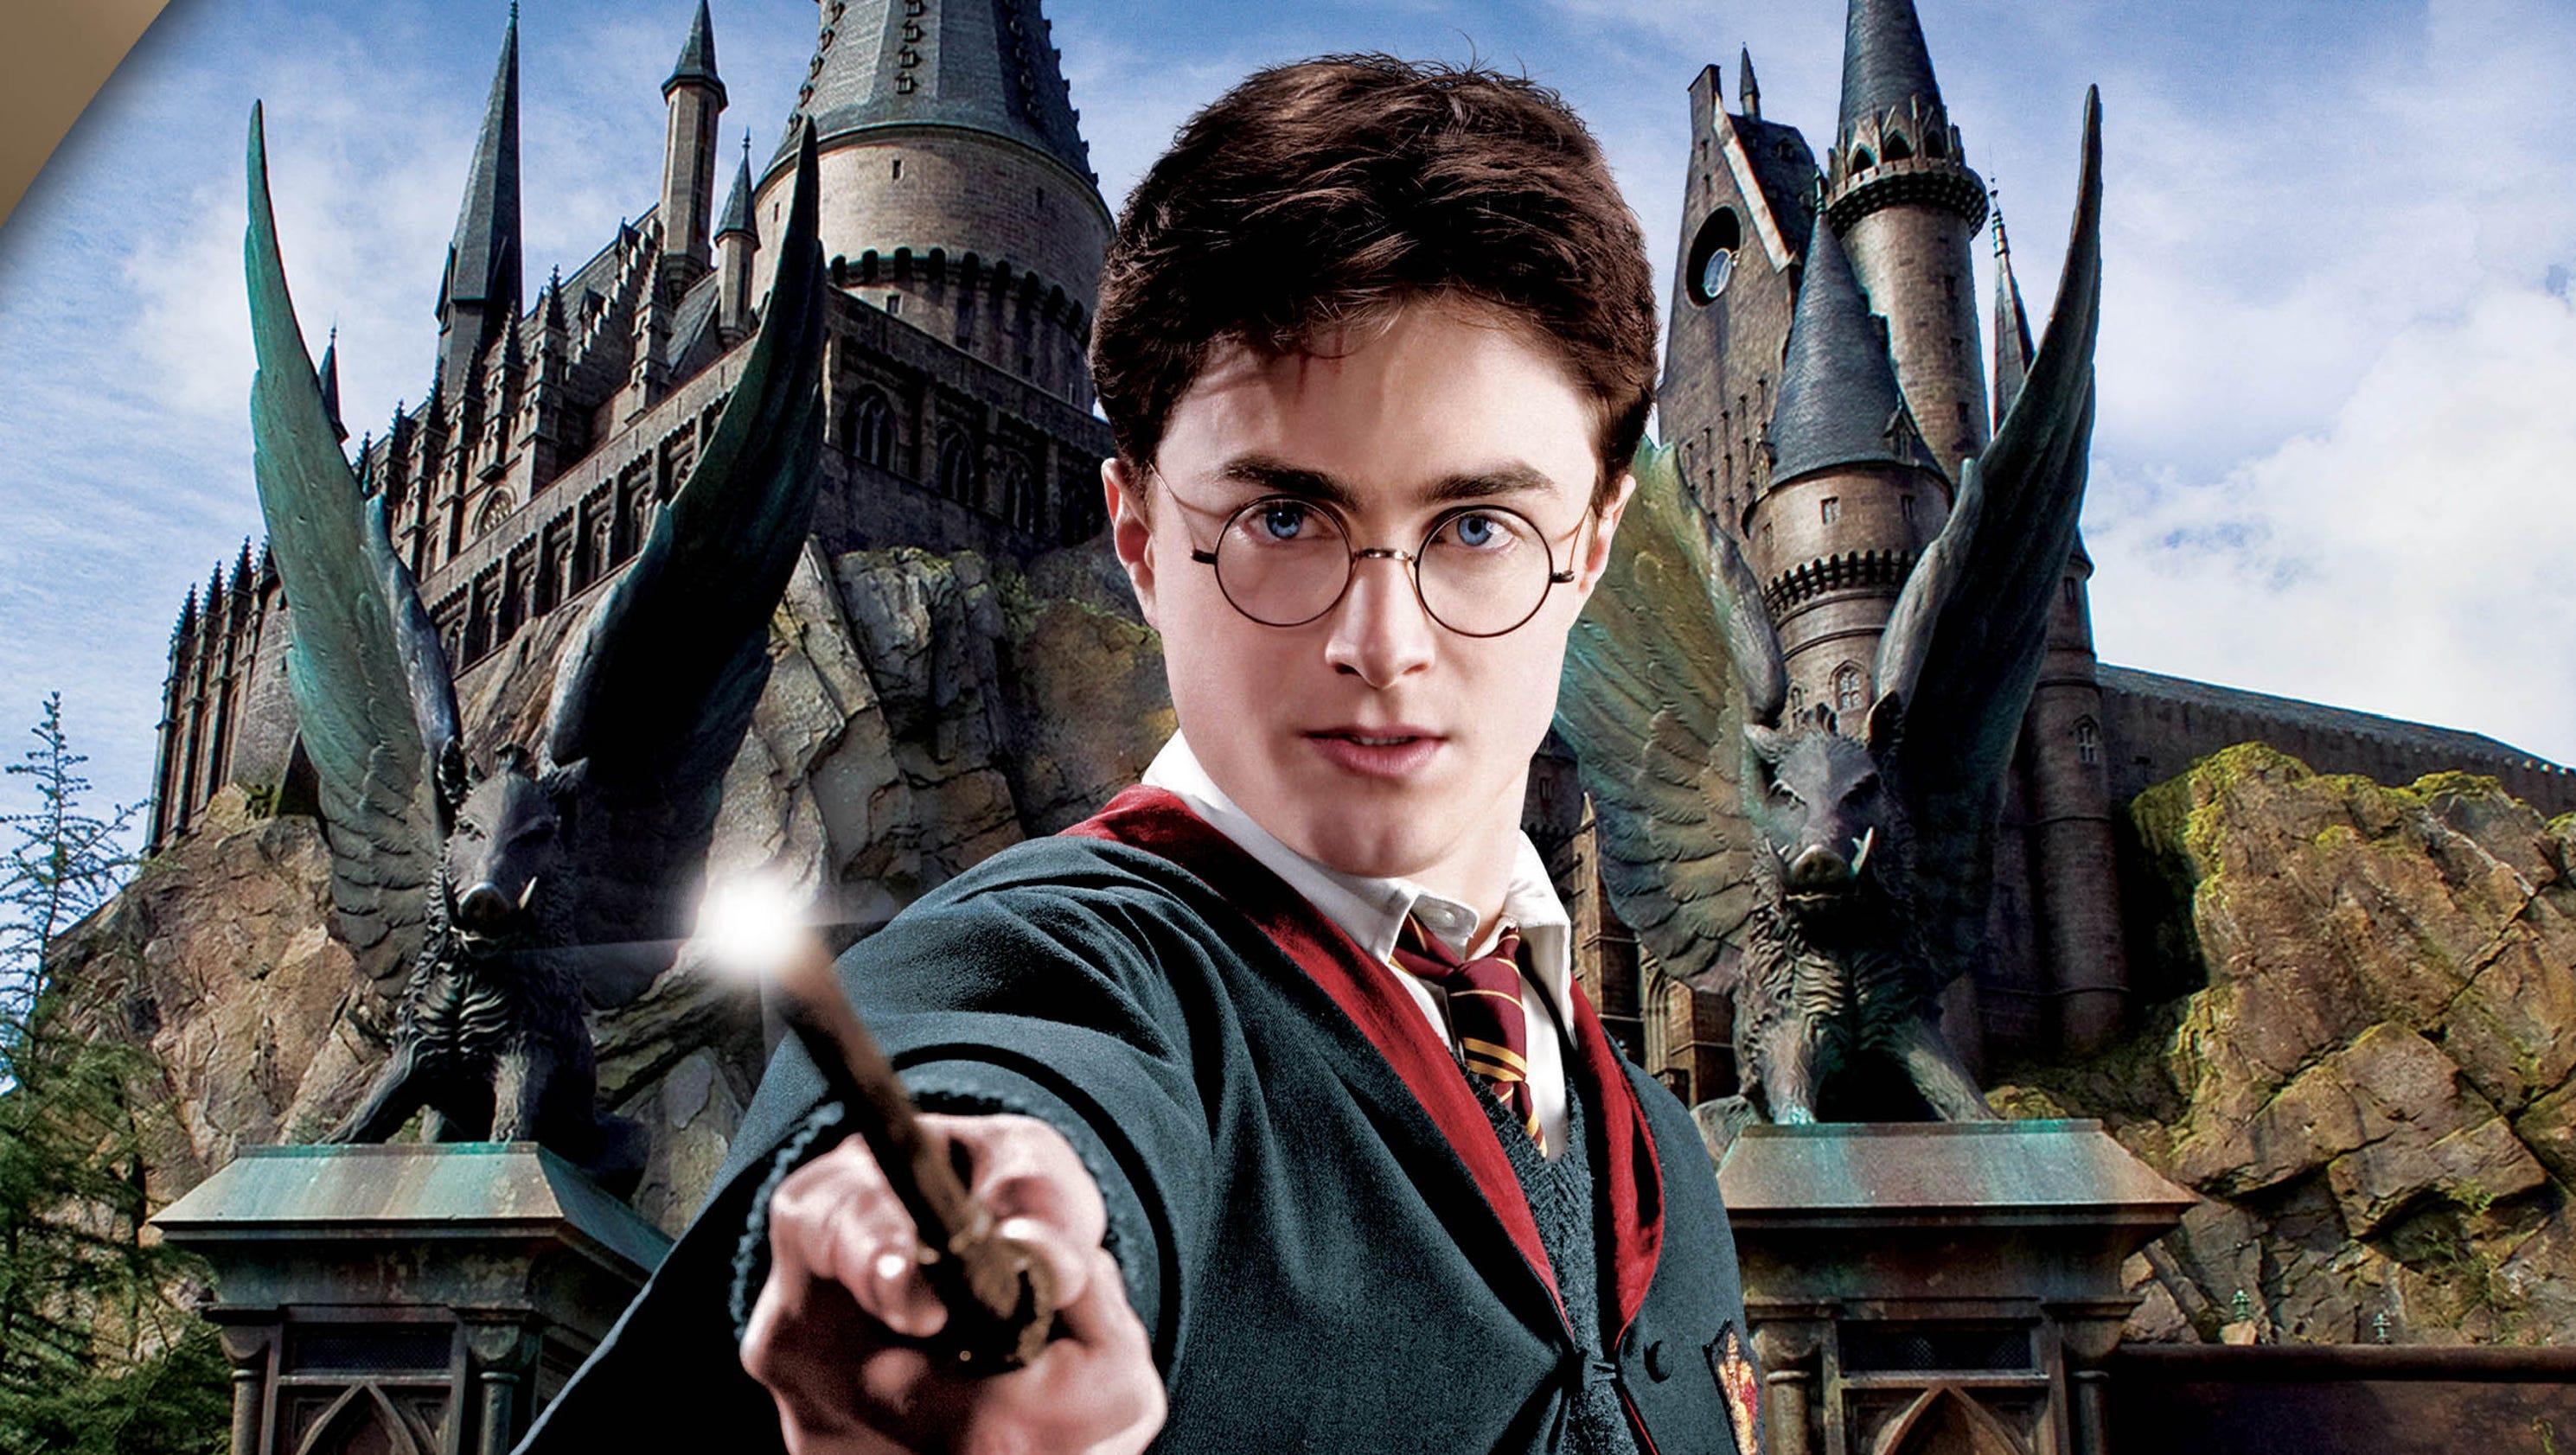 Harry Pottering